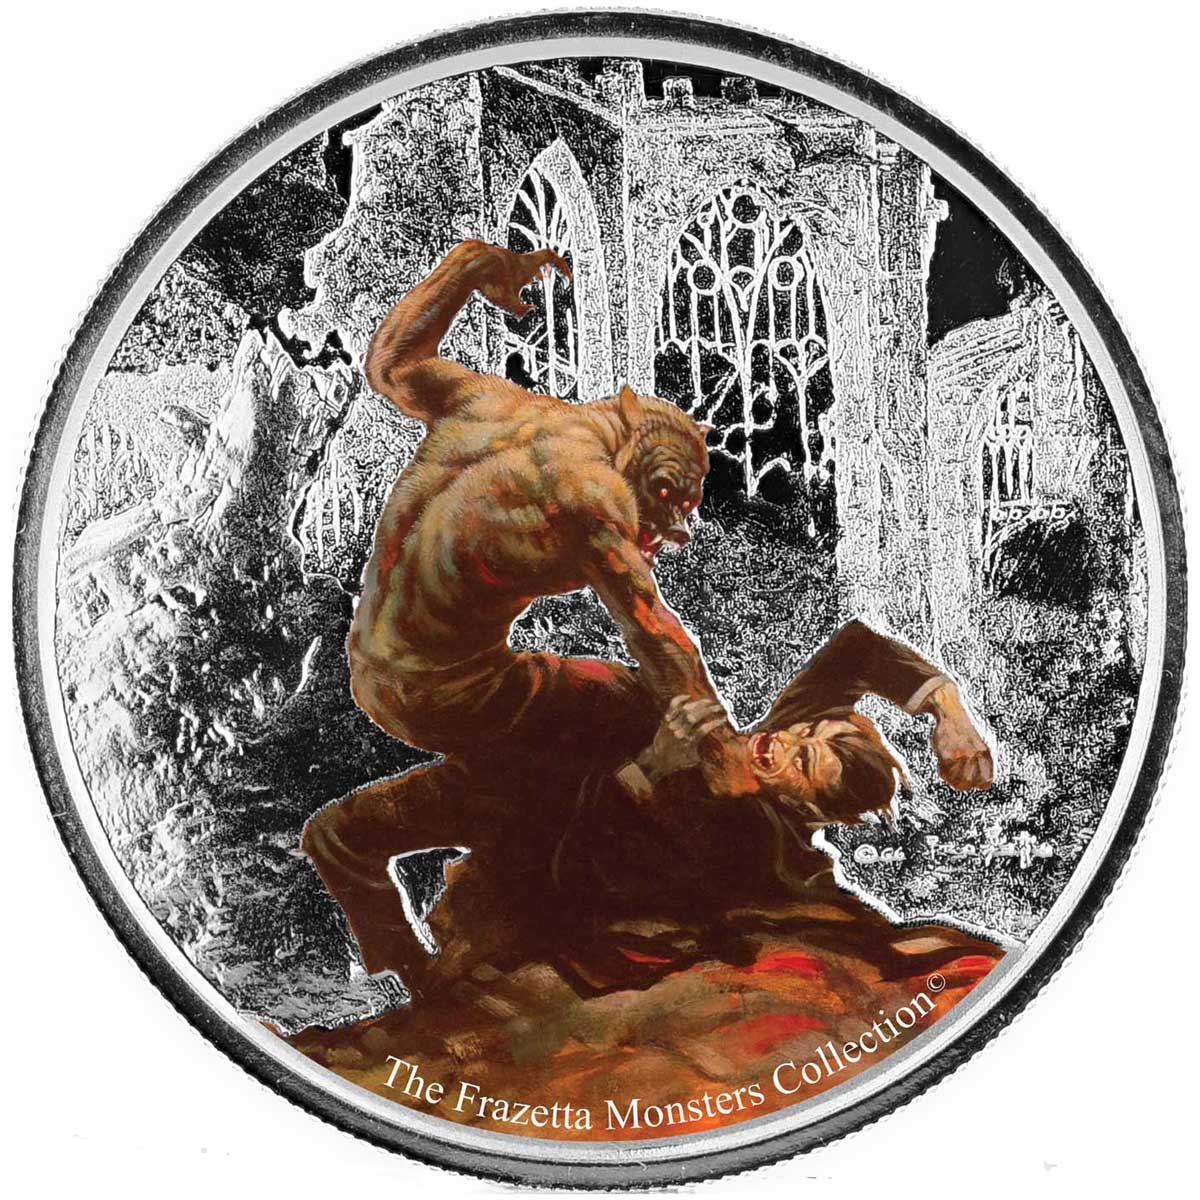 2017 Frazetta Monsters: Werewolf vs The Count 1oz Silver